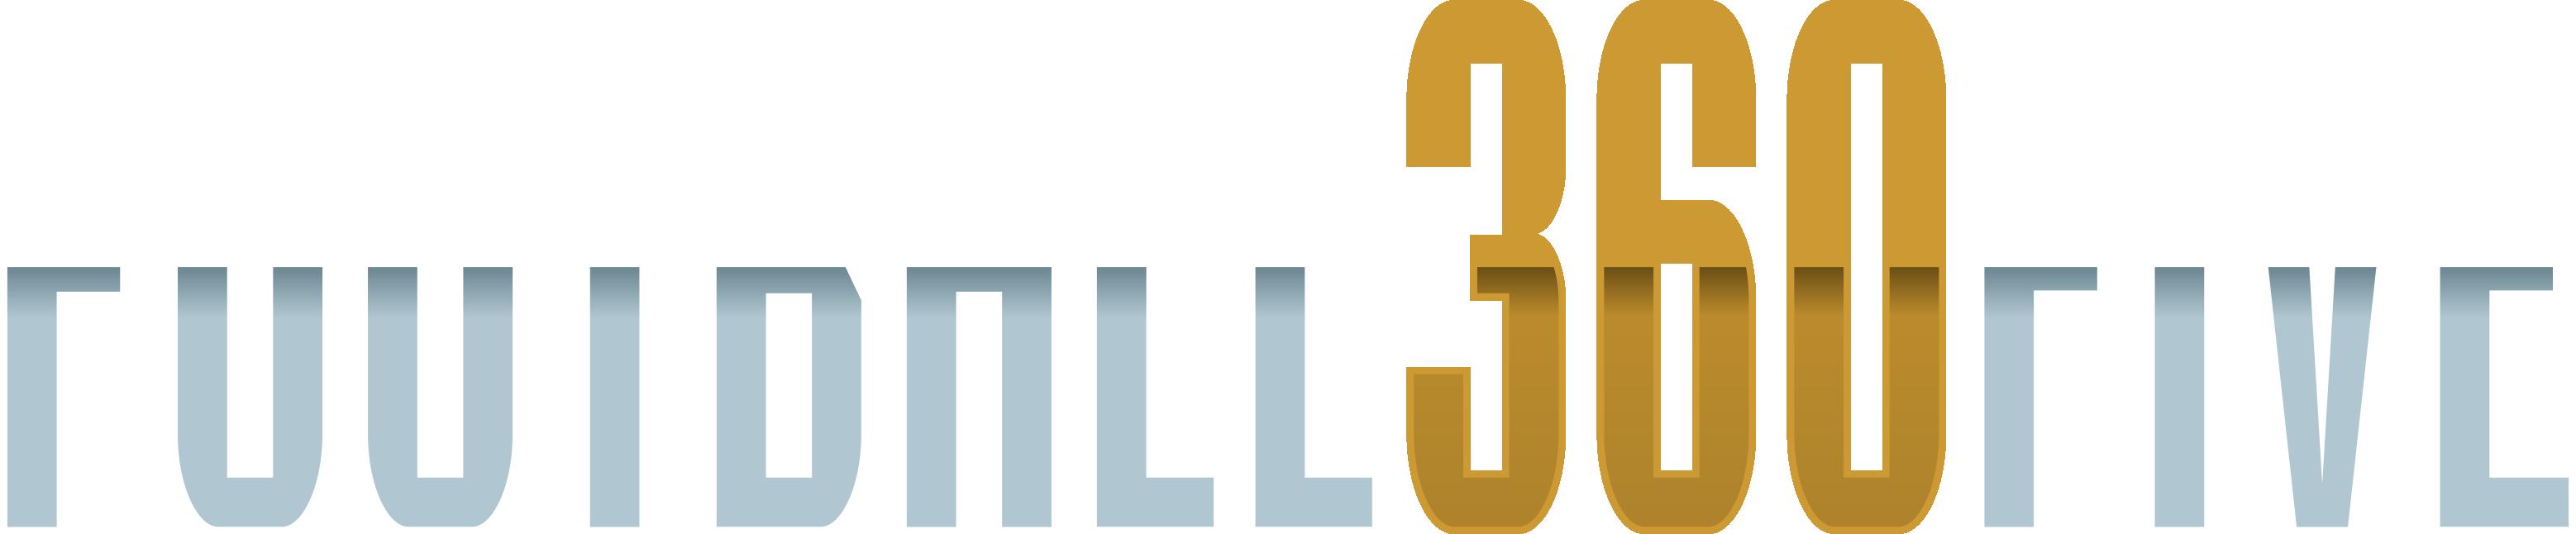 Football 360 Five